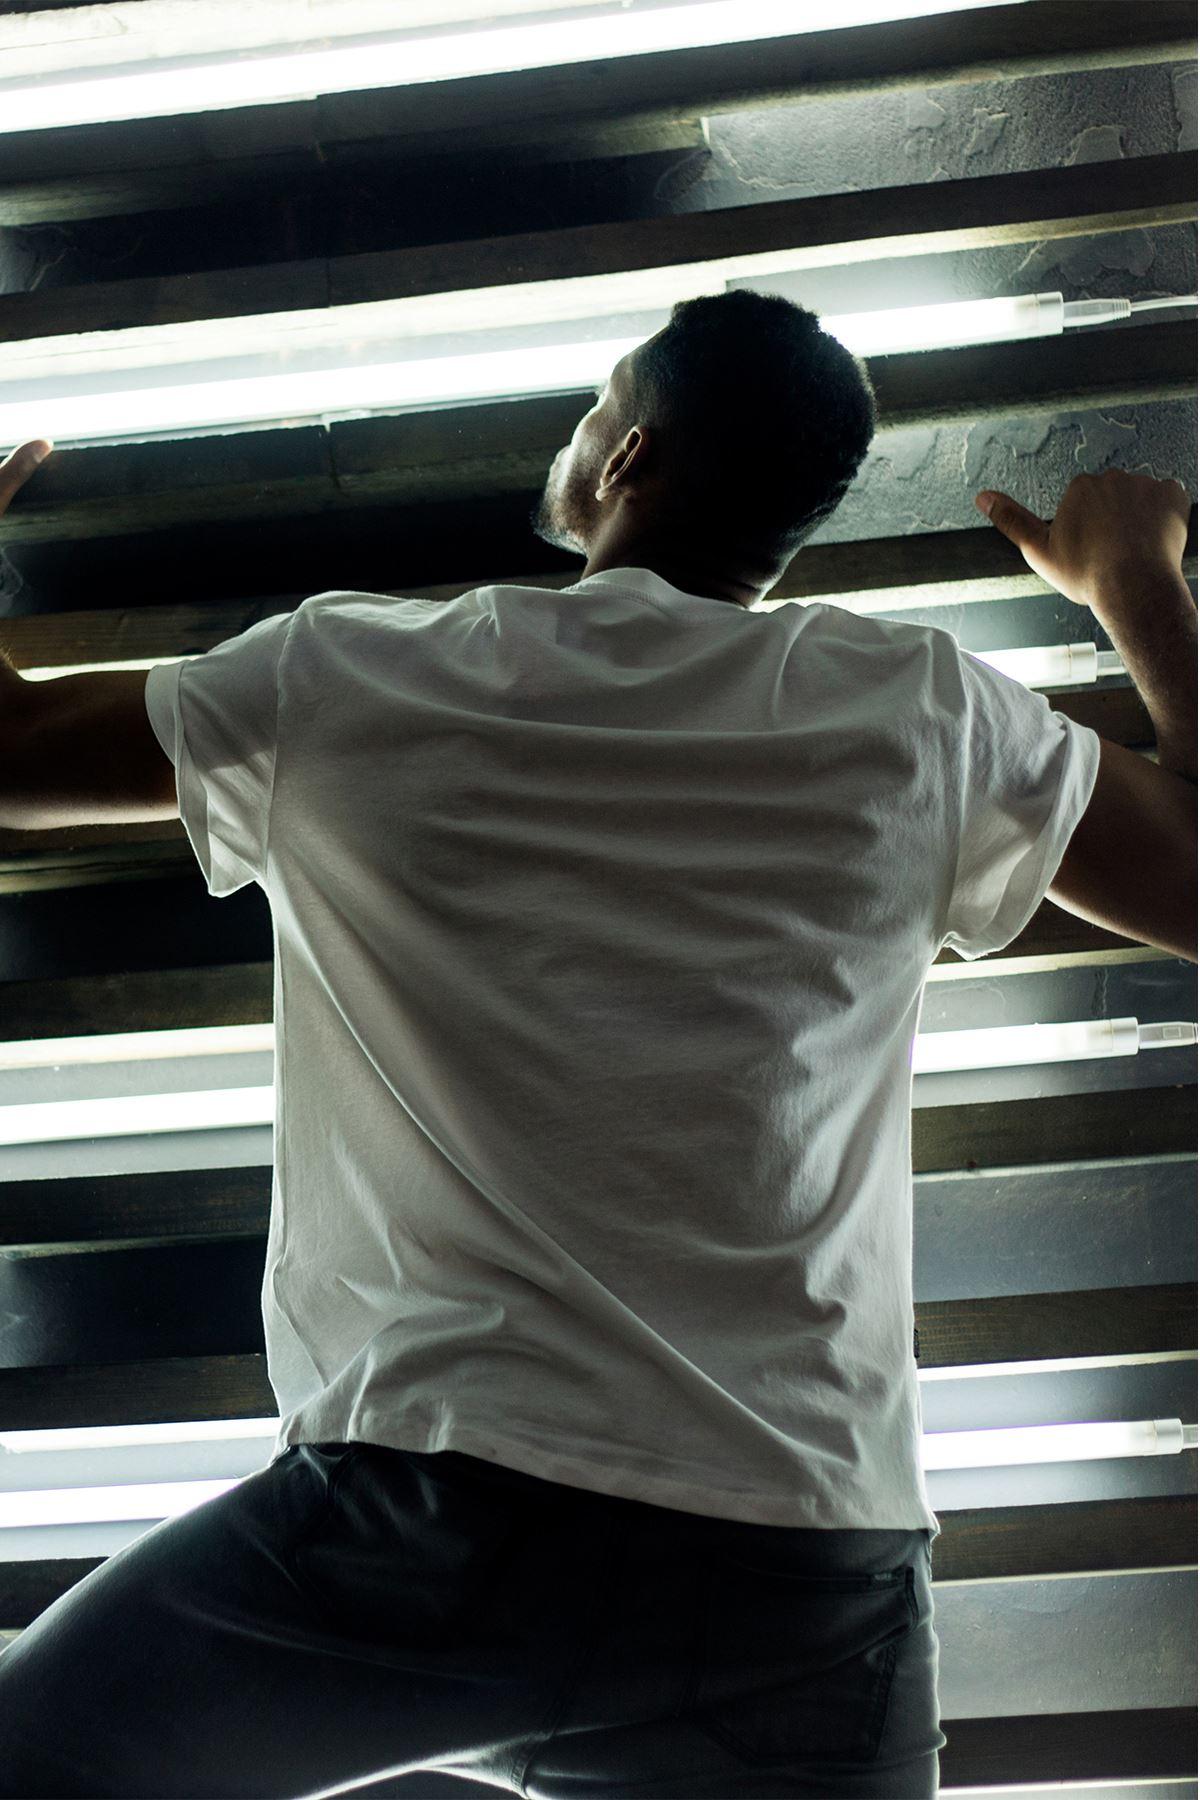 Miami Heat 165 Beyaz Erkek Oversize Tshirt - Tişört